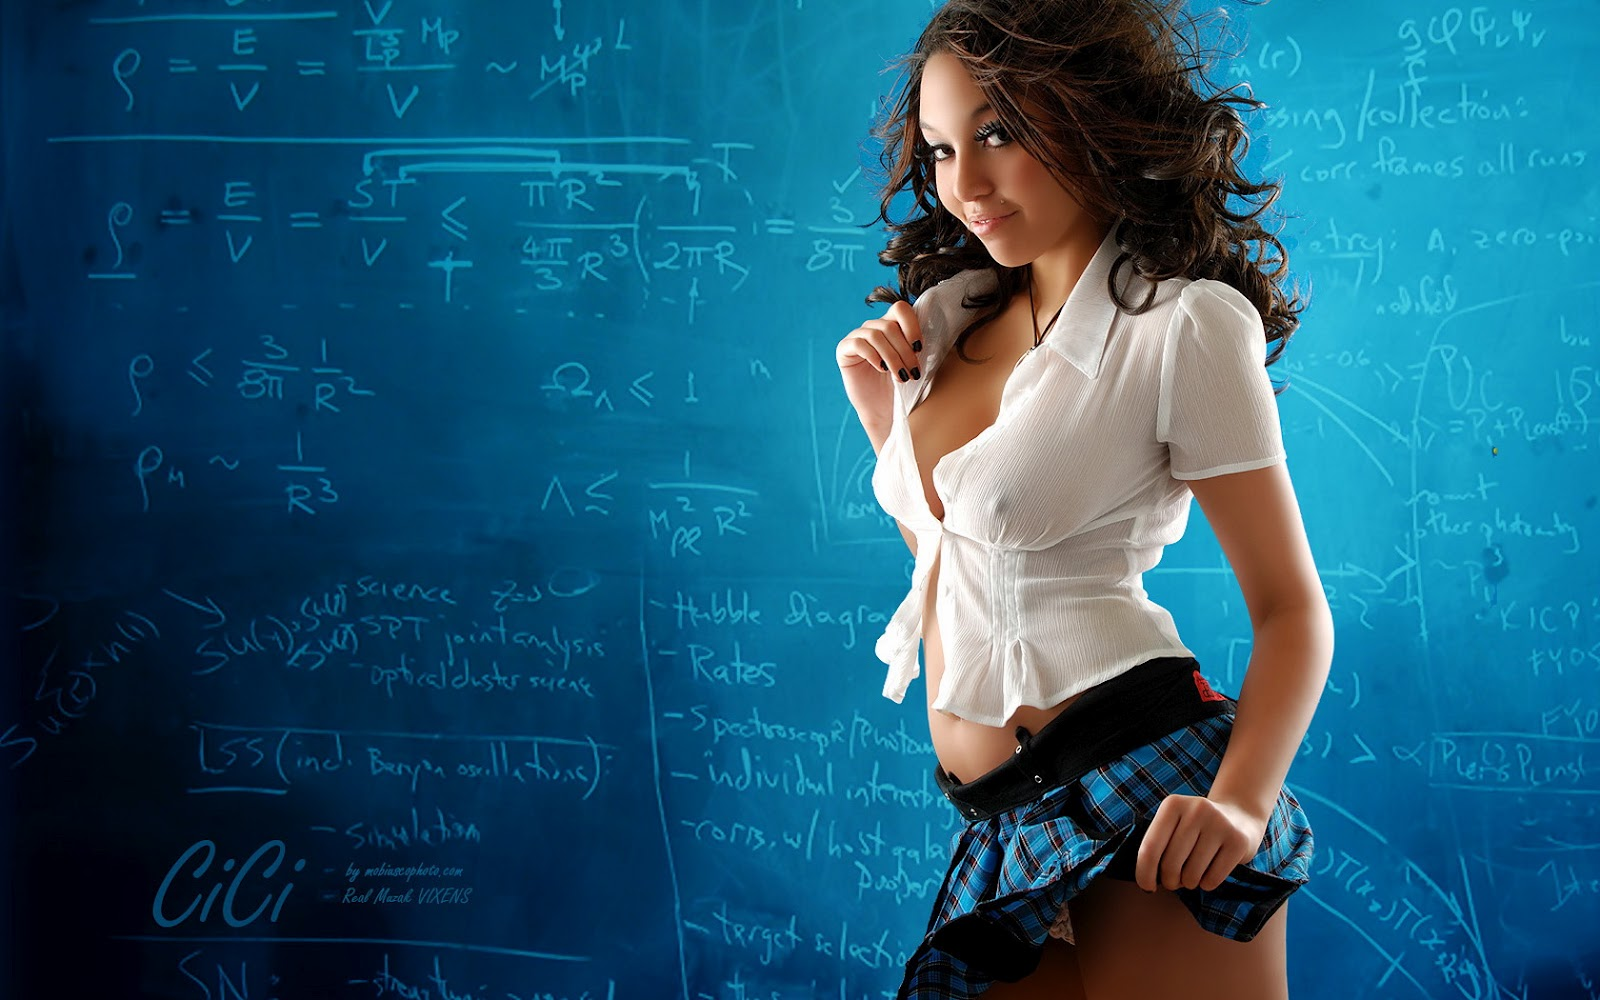 http://2.bp.blogspot.com/-IxnPUhWIH74/UQIi0wdCDJI/AAAAAAAAAQk/t1lu04XKEQM/s1600/a+School+Girls+6.jpg